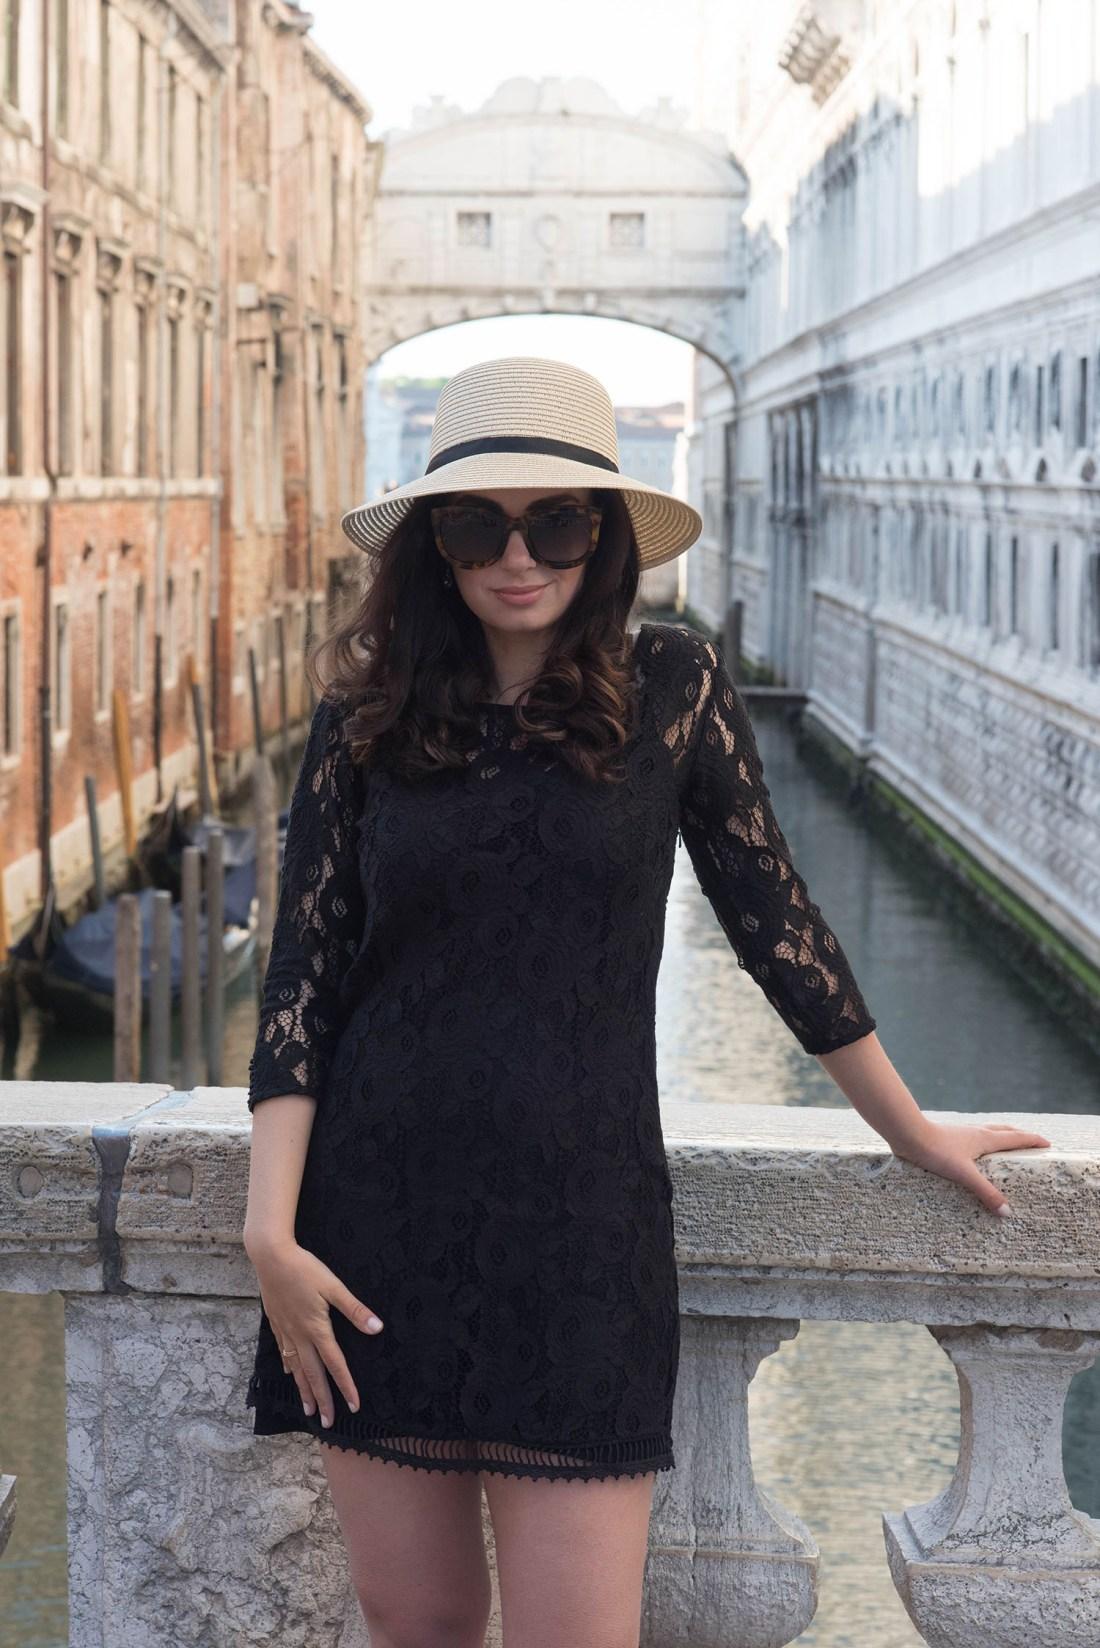 Portrait of fashion blogger Cee Fardoe of Coco & Vera wearing Anine Bing Los Angeles sunglasses and a Gentlefawn dress in Venice